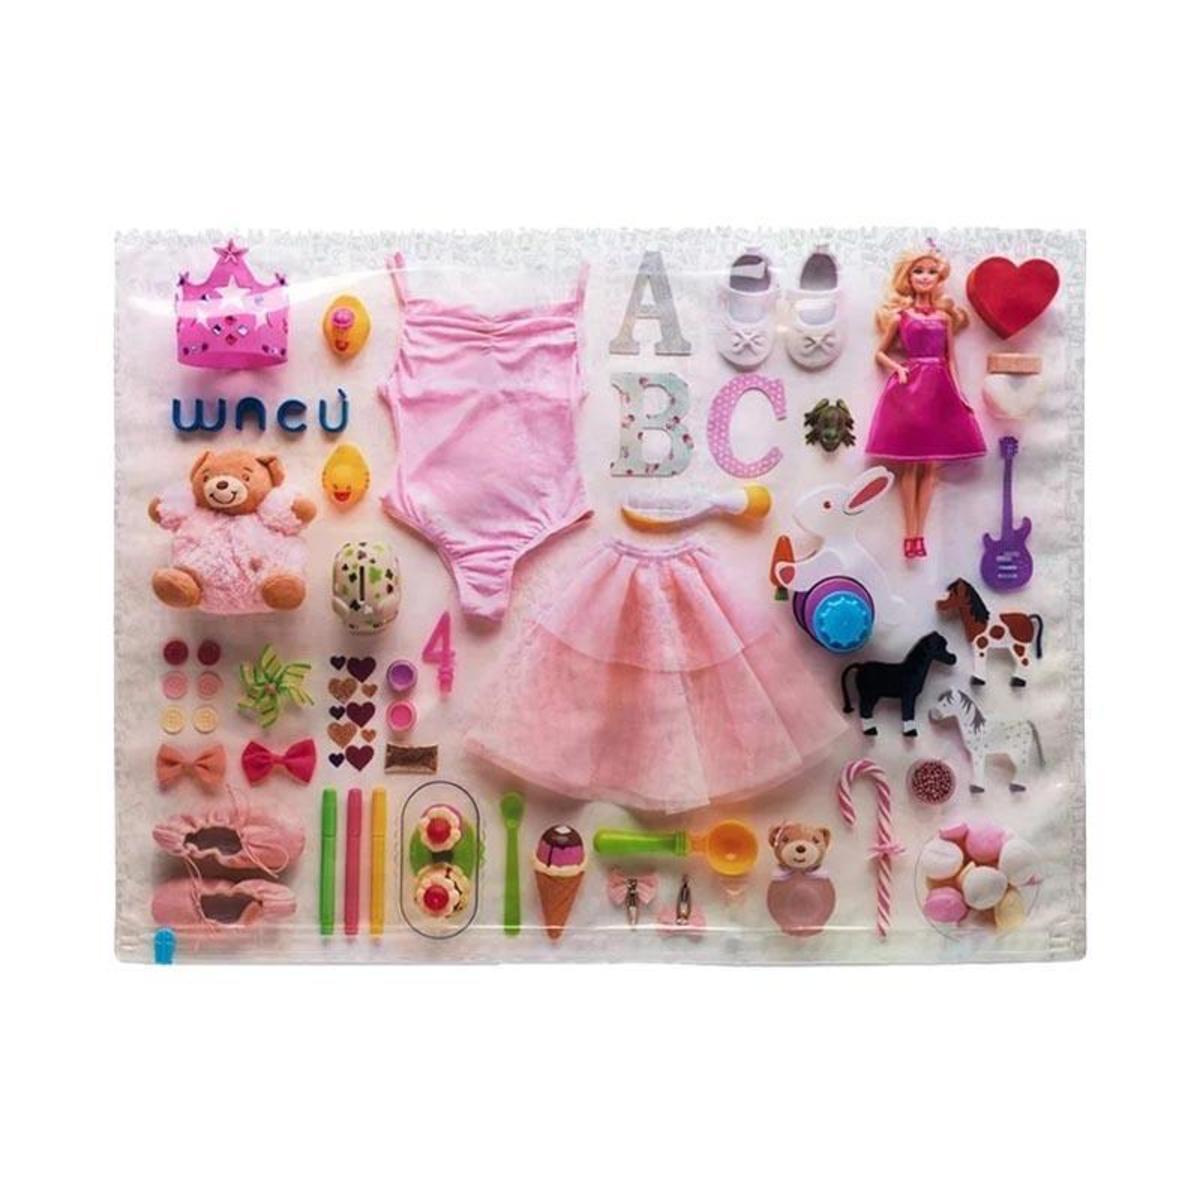 Wacù® vacuum bag 2 packs Italian brand - The Little Princess / Medium Size